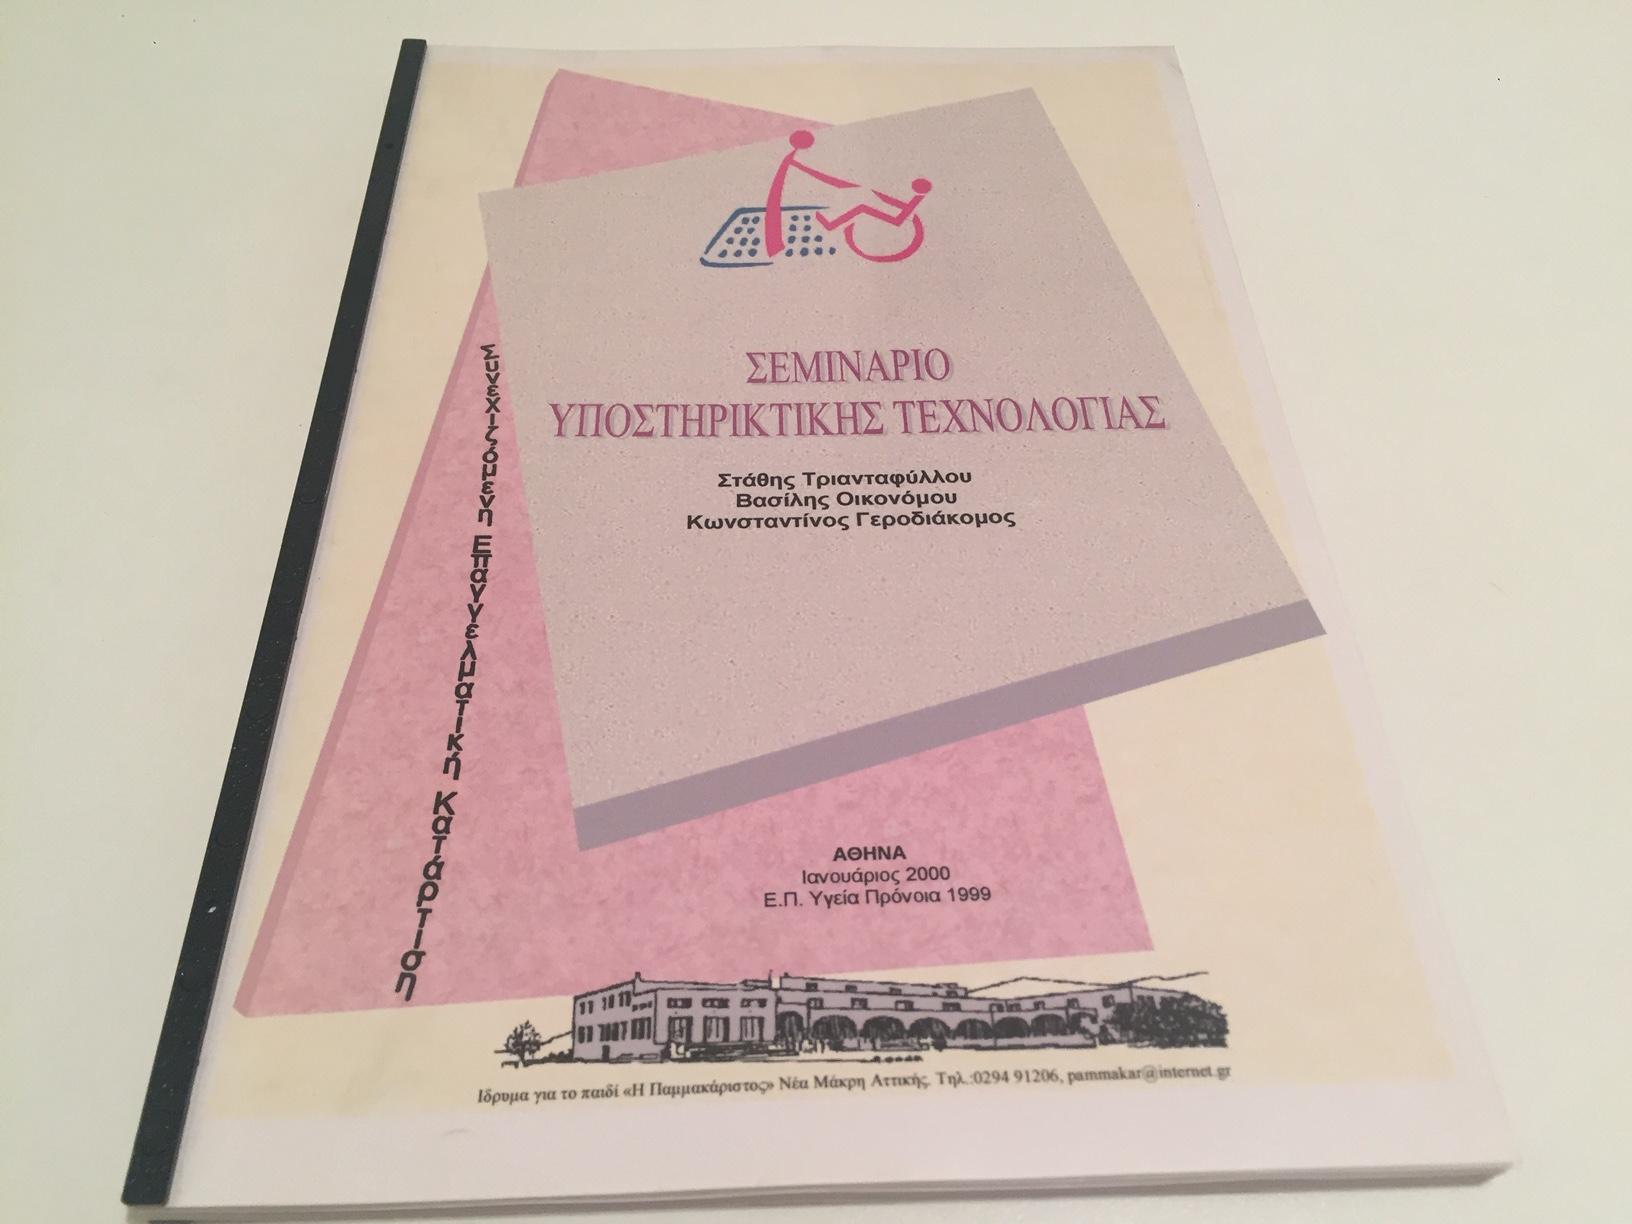 LOGO-ΟΙΚΟΝΟΜΟΘ-ΤΡΙΑΝΤΑΦΥΛΟΥ-ΓΕΡΟΔΙΑΚΟΜΟΣ